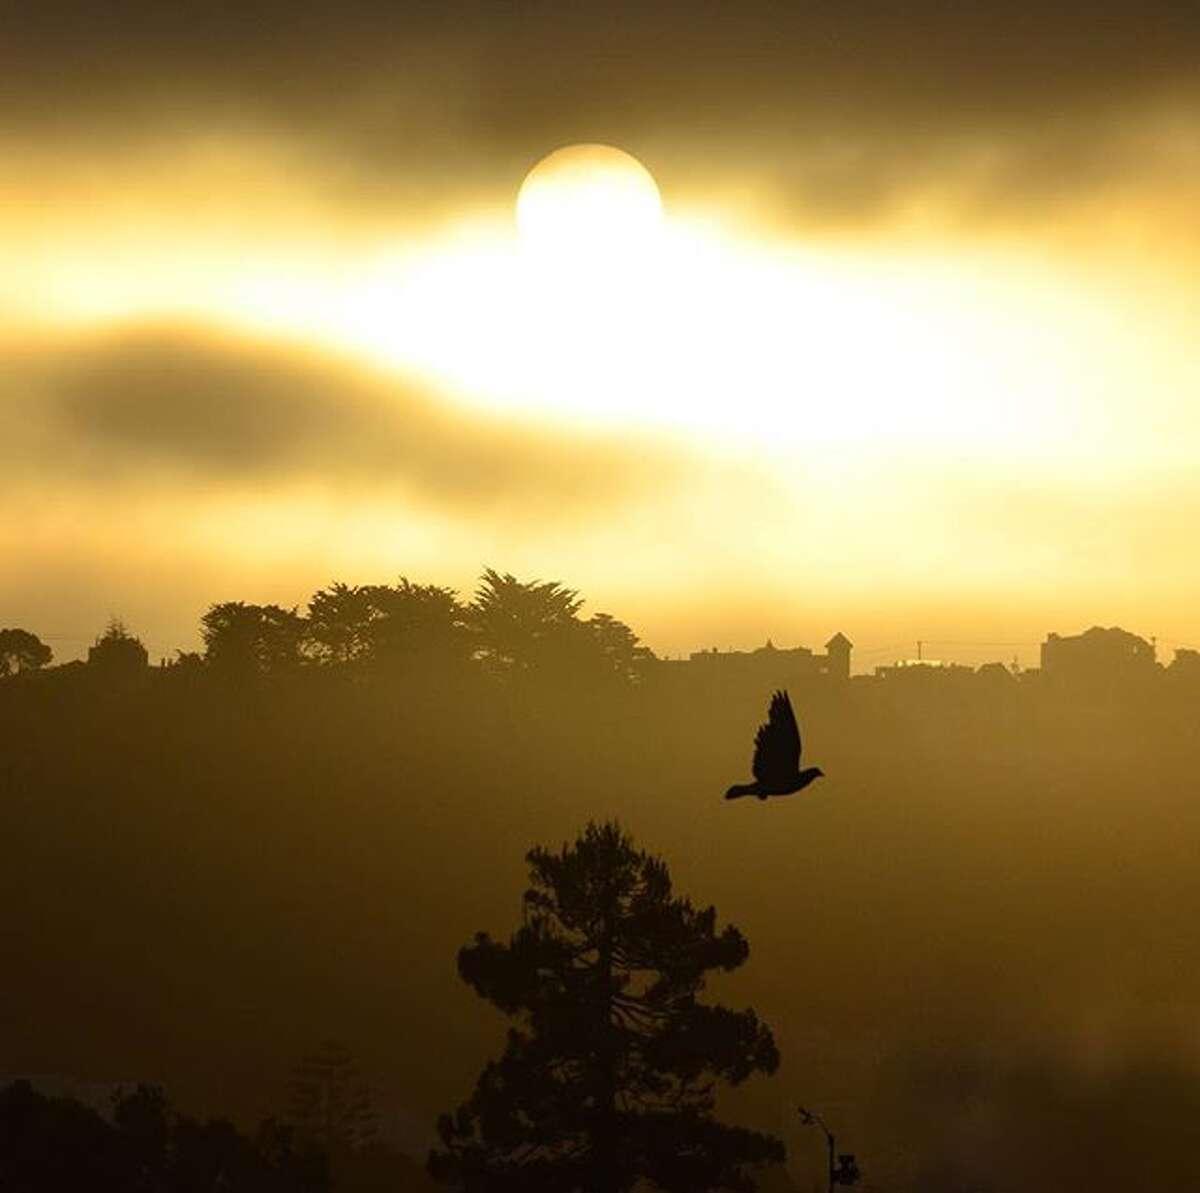 @spectrephotos woke up at 6 am on a Sunday to capture this stunning image.